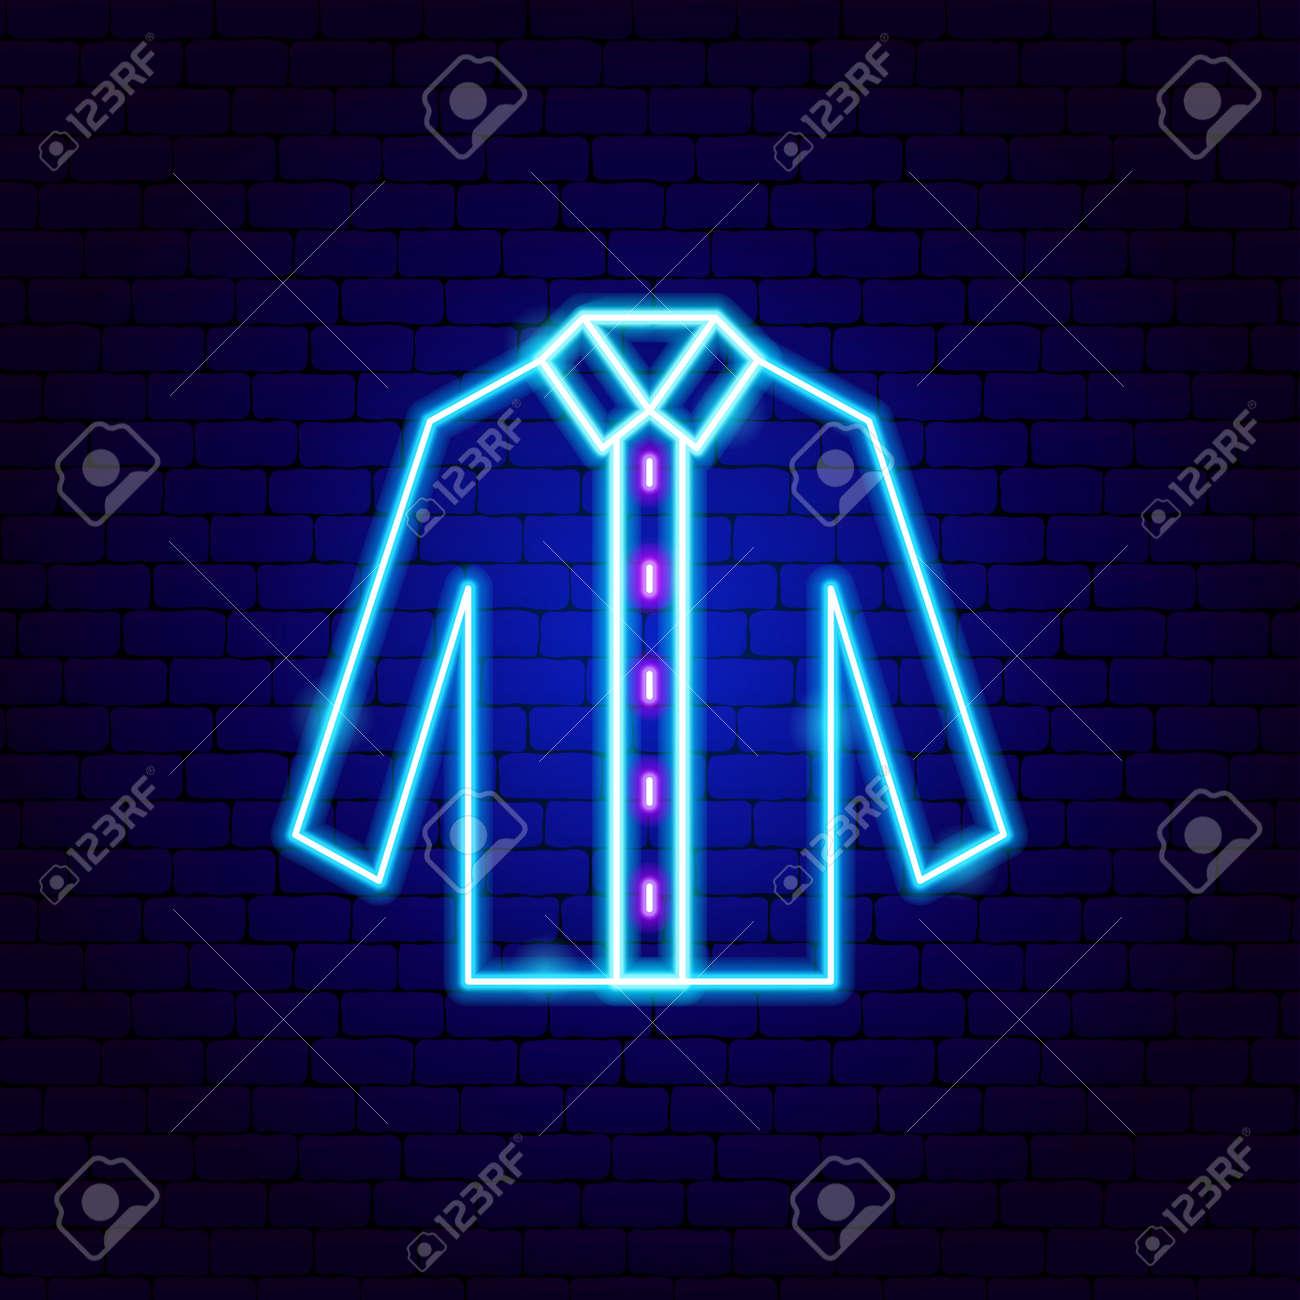 Shirt Neon Sign - 168963308